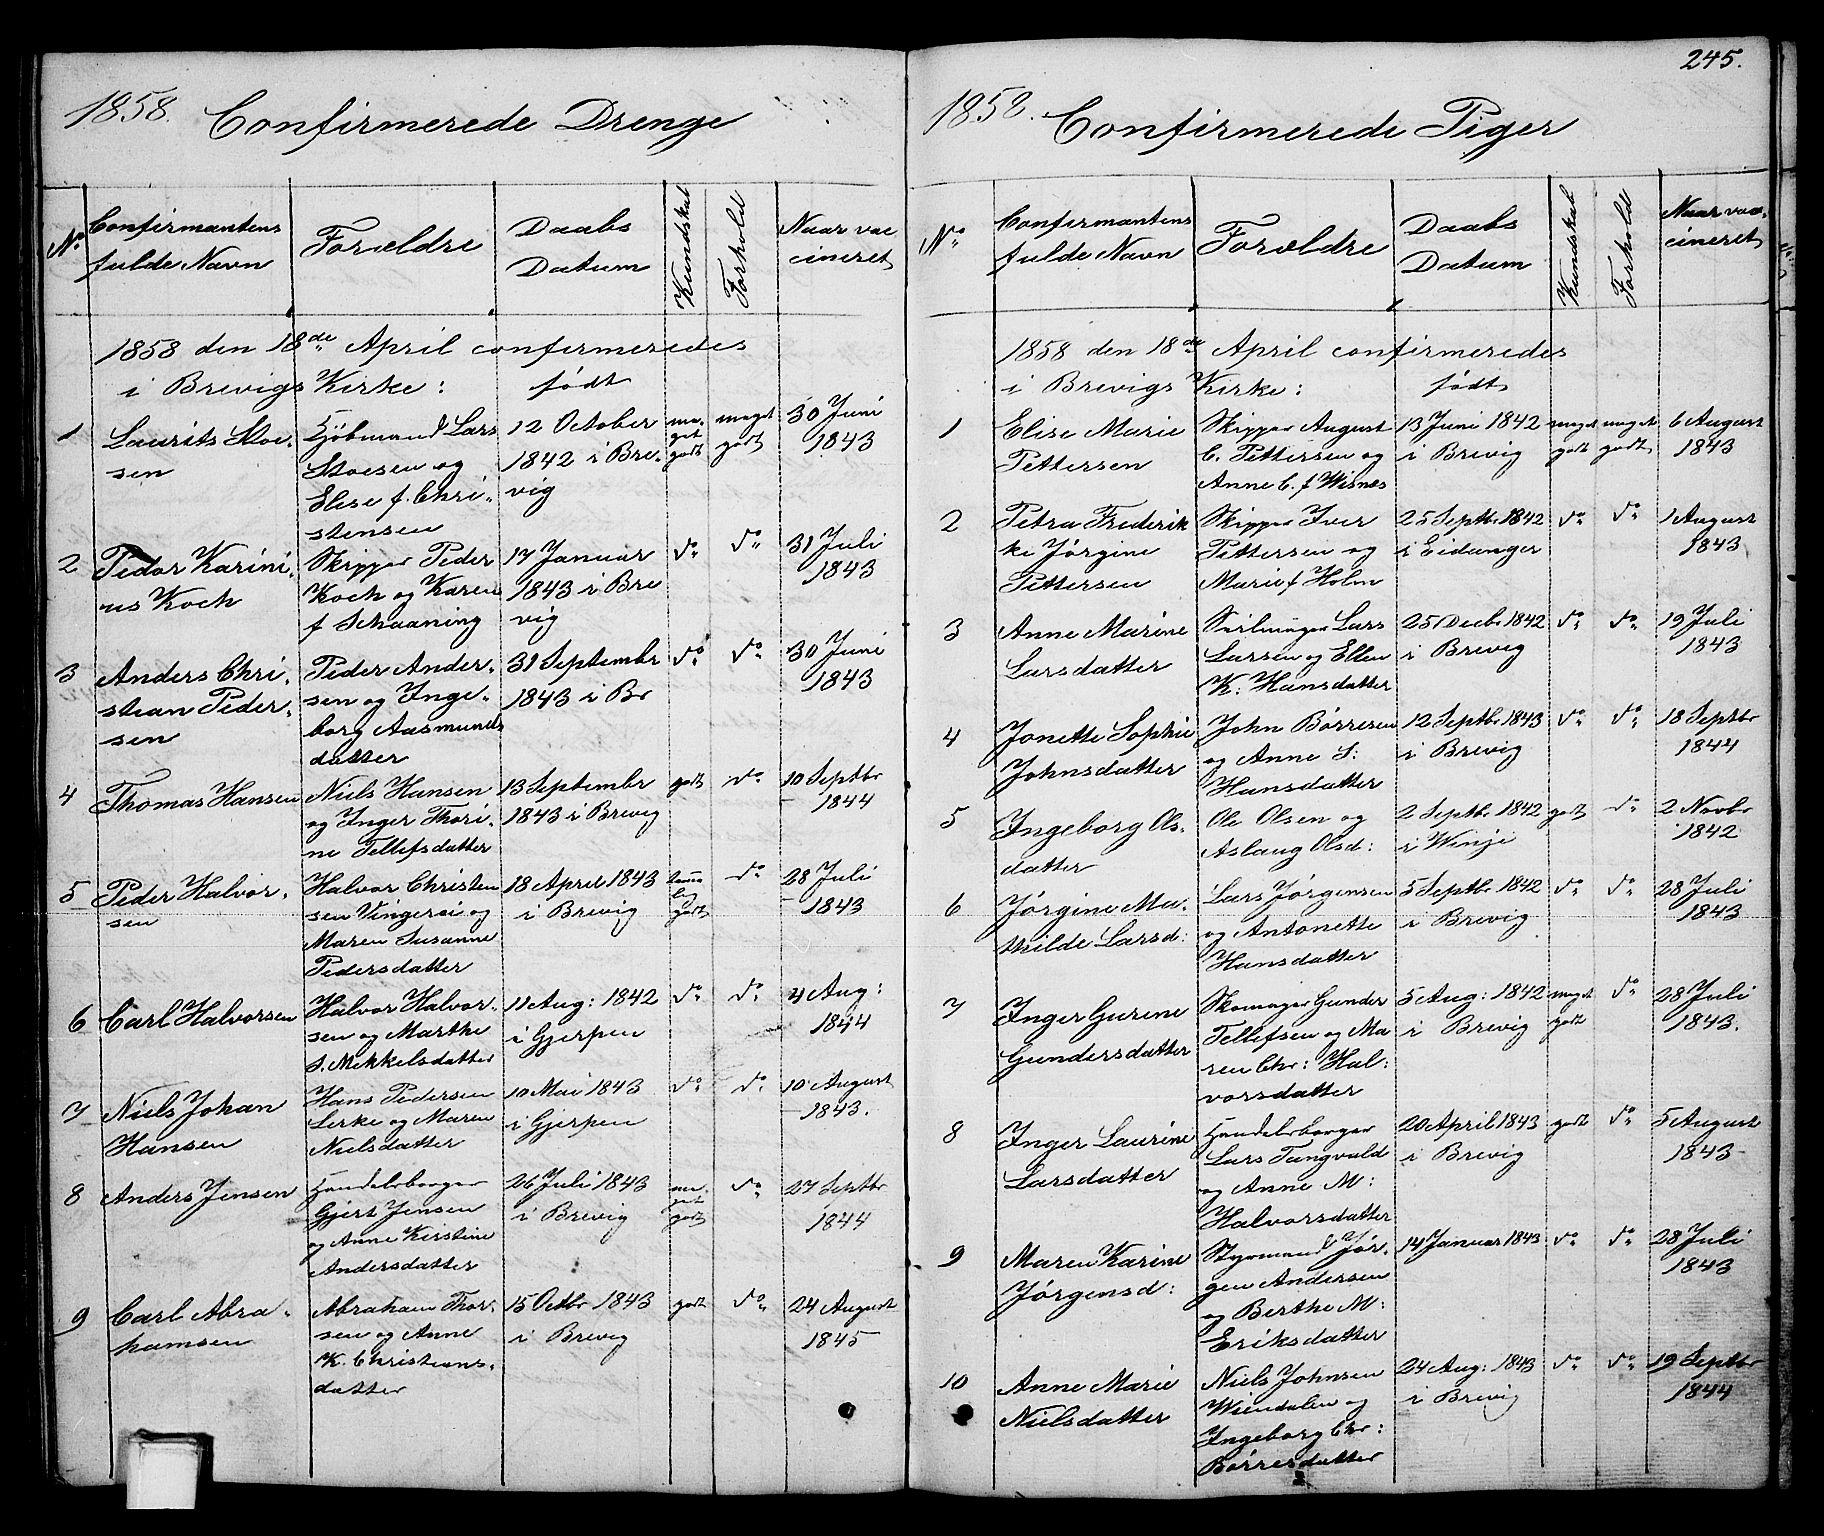 SAKO, Brevik kirkebøker, G/Ga/L0002: Klokkerbok nr. 2, 1846-1865, s. 245